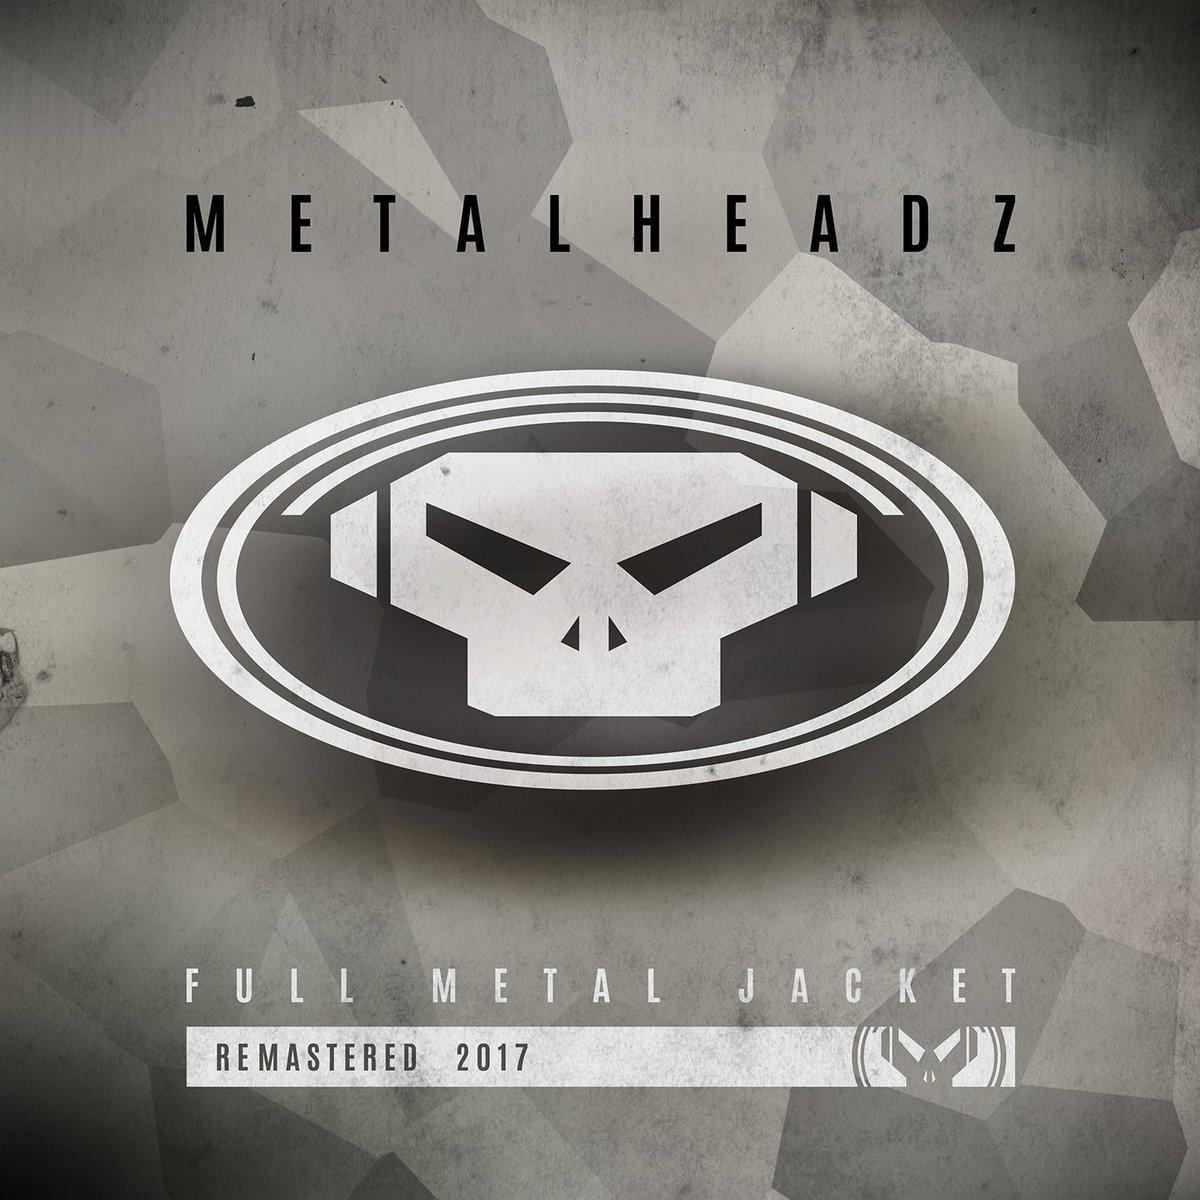 S. P. Y full metal jacket / beyond the threshold run dnb mp3.